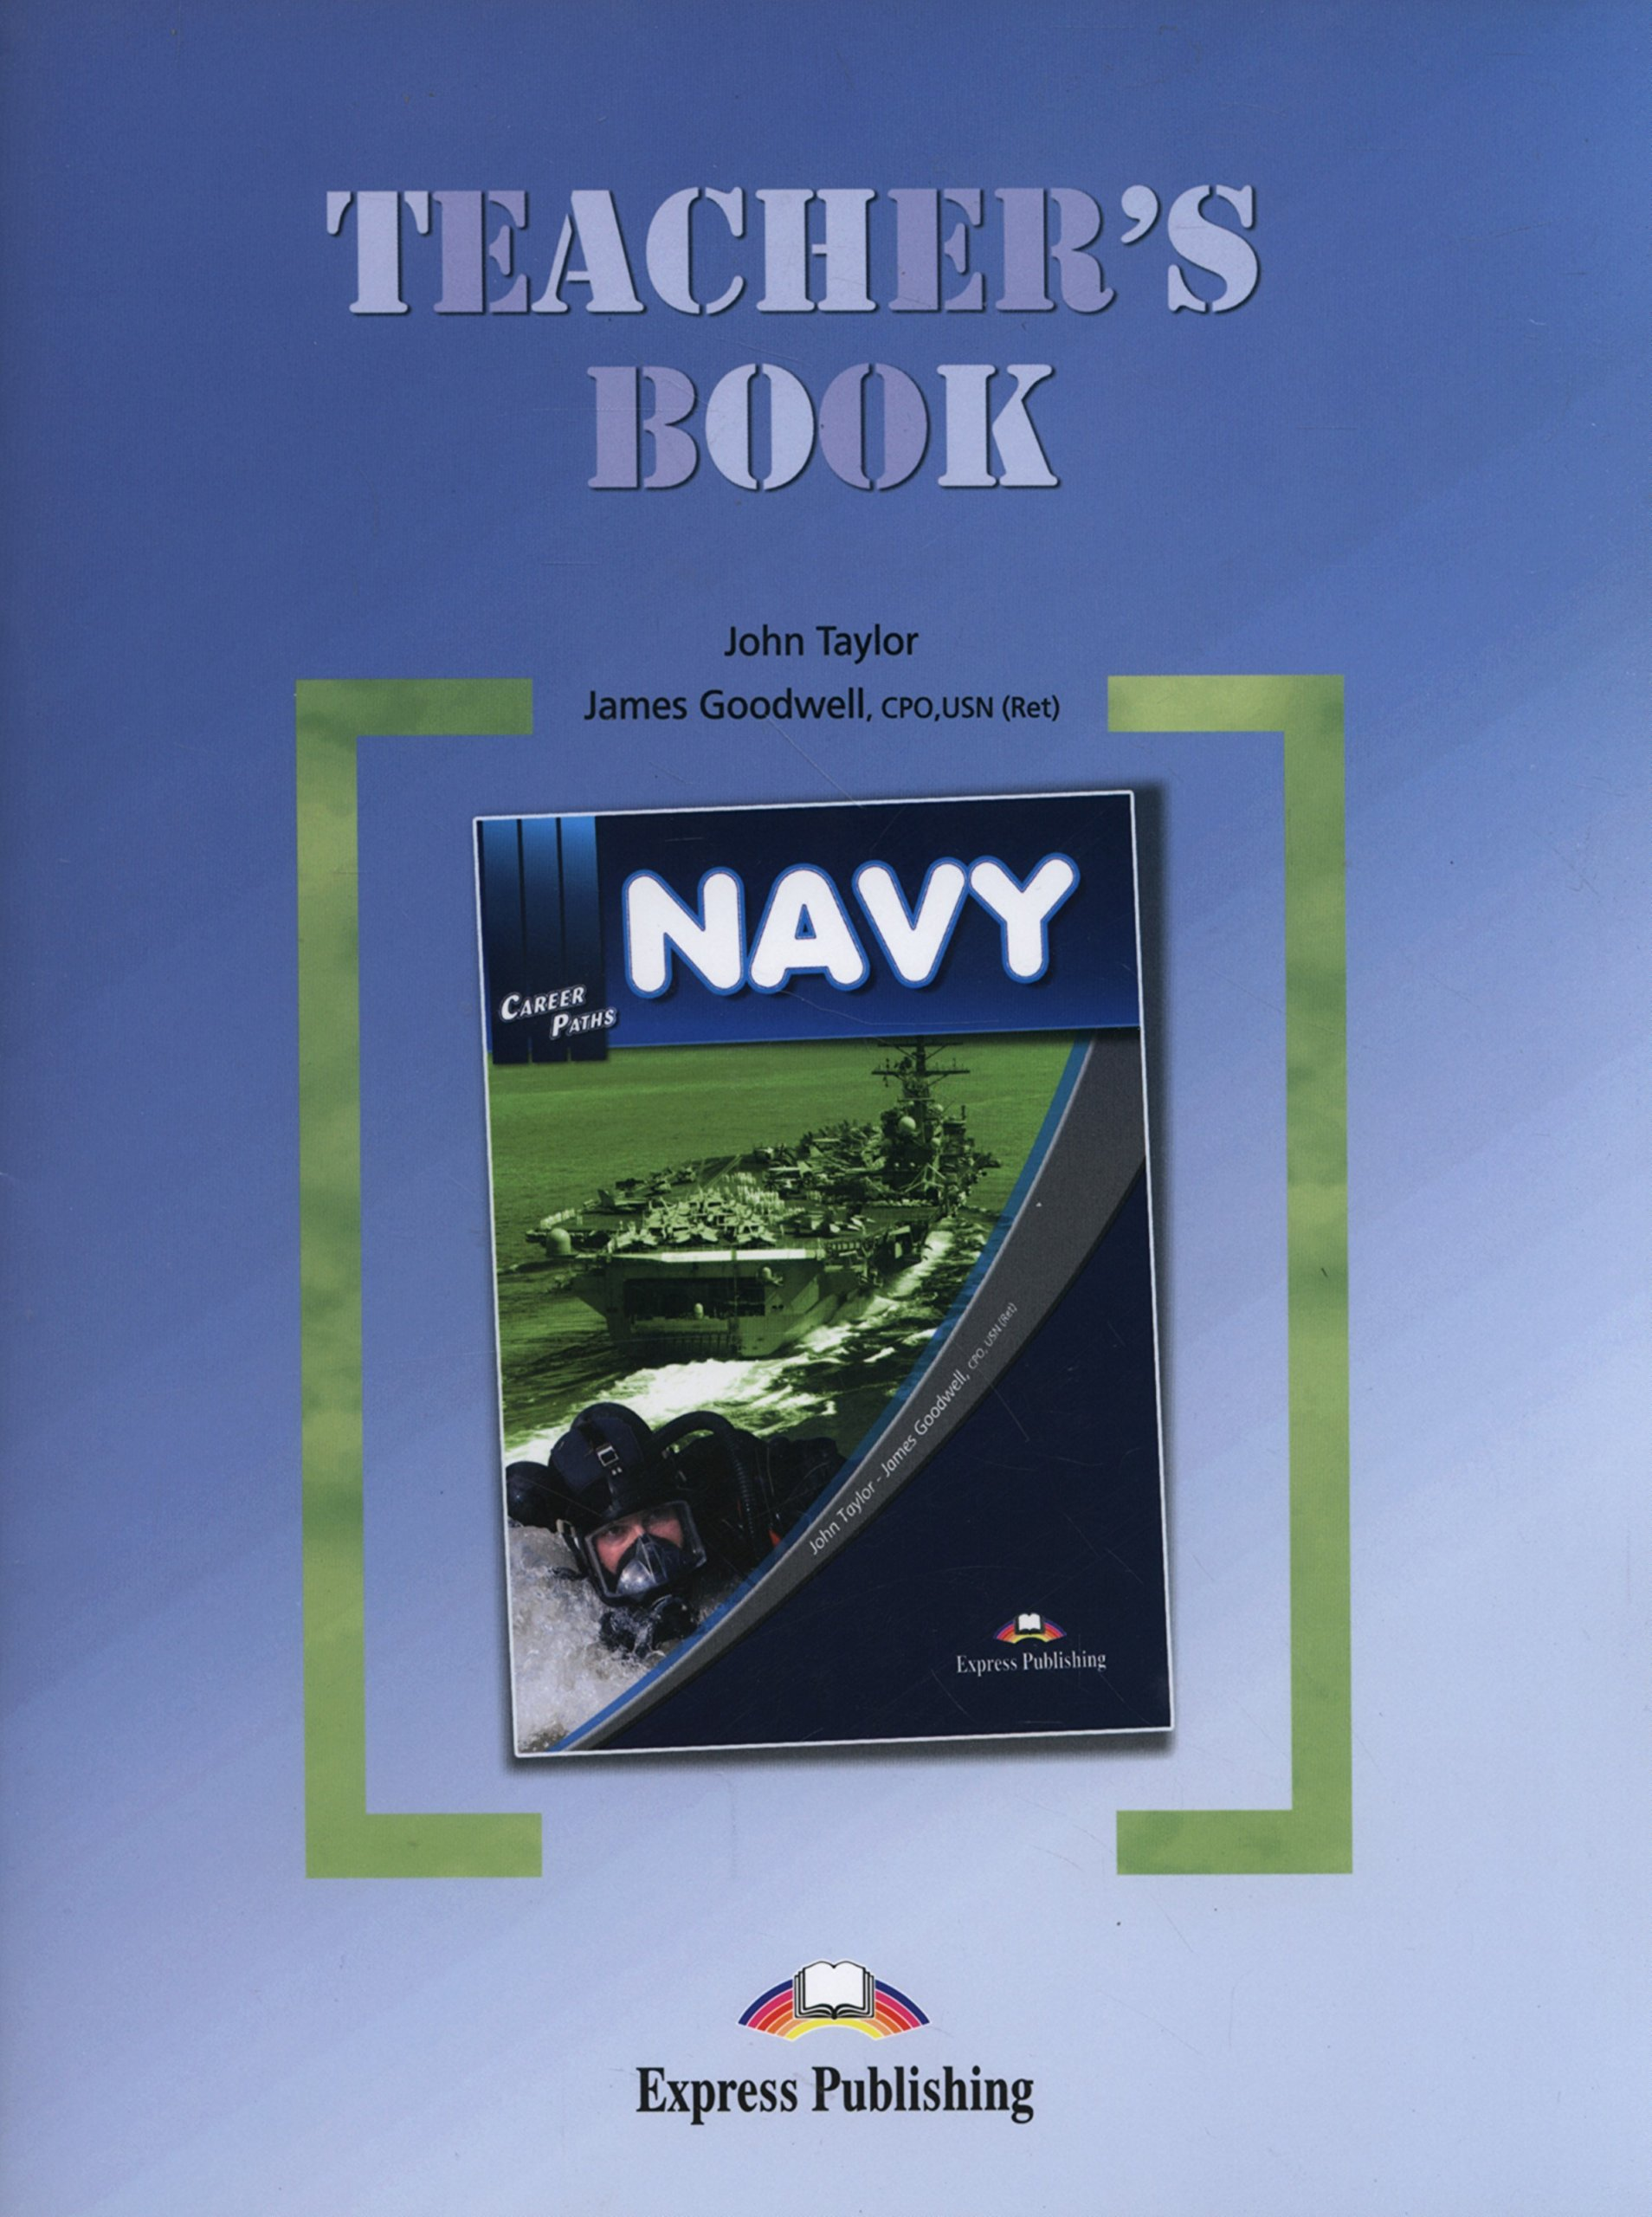 Career Paths - Navy: Teacher's Book (International) PDF